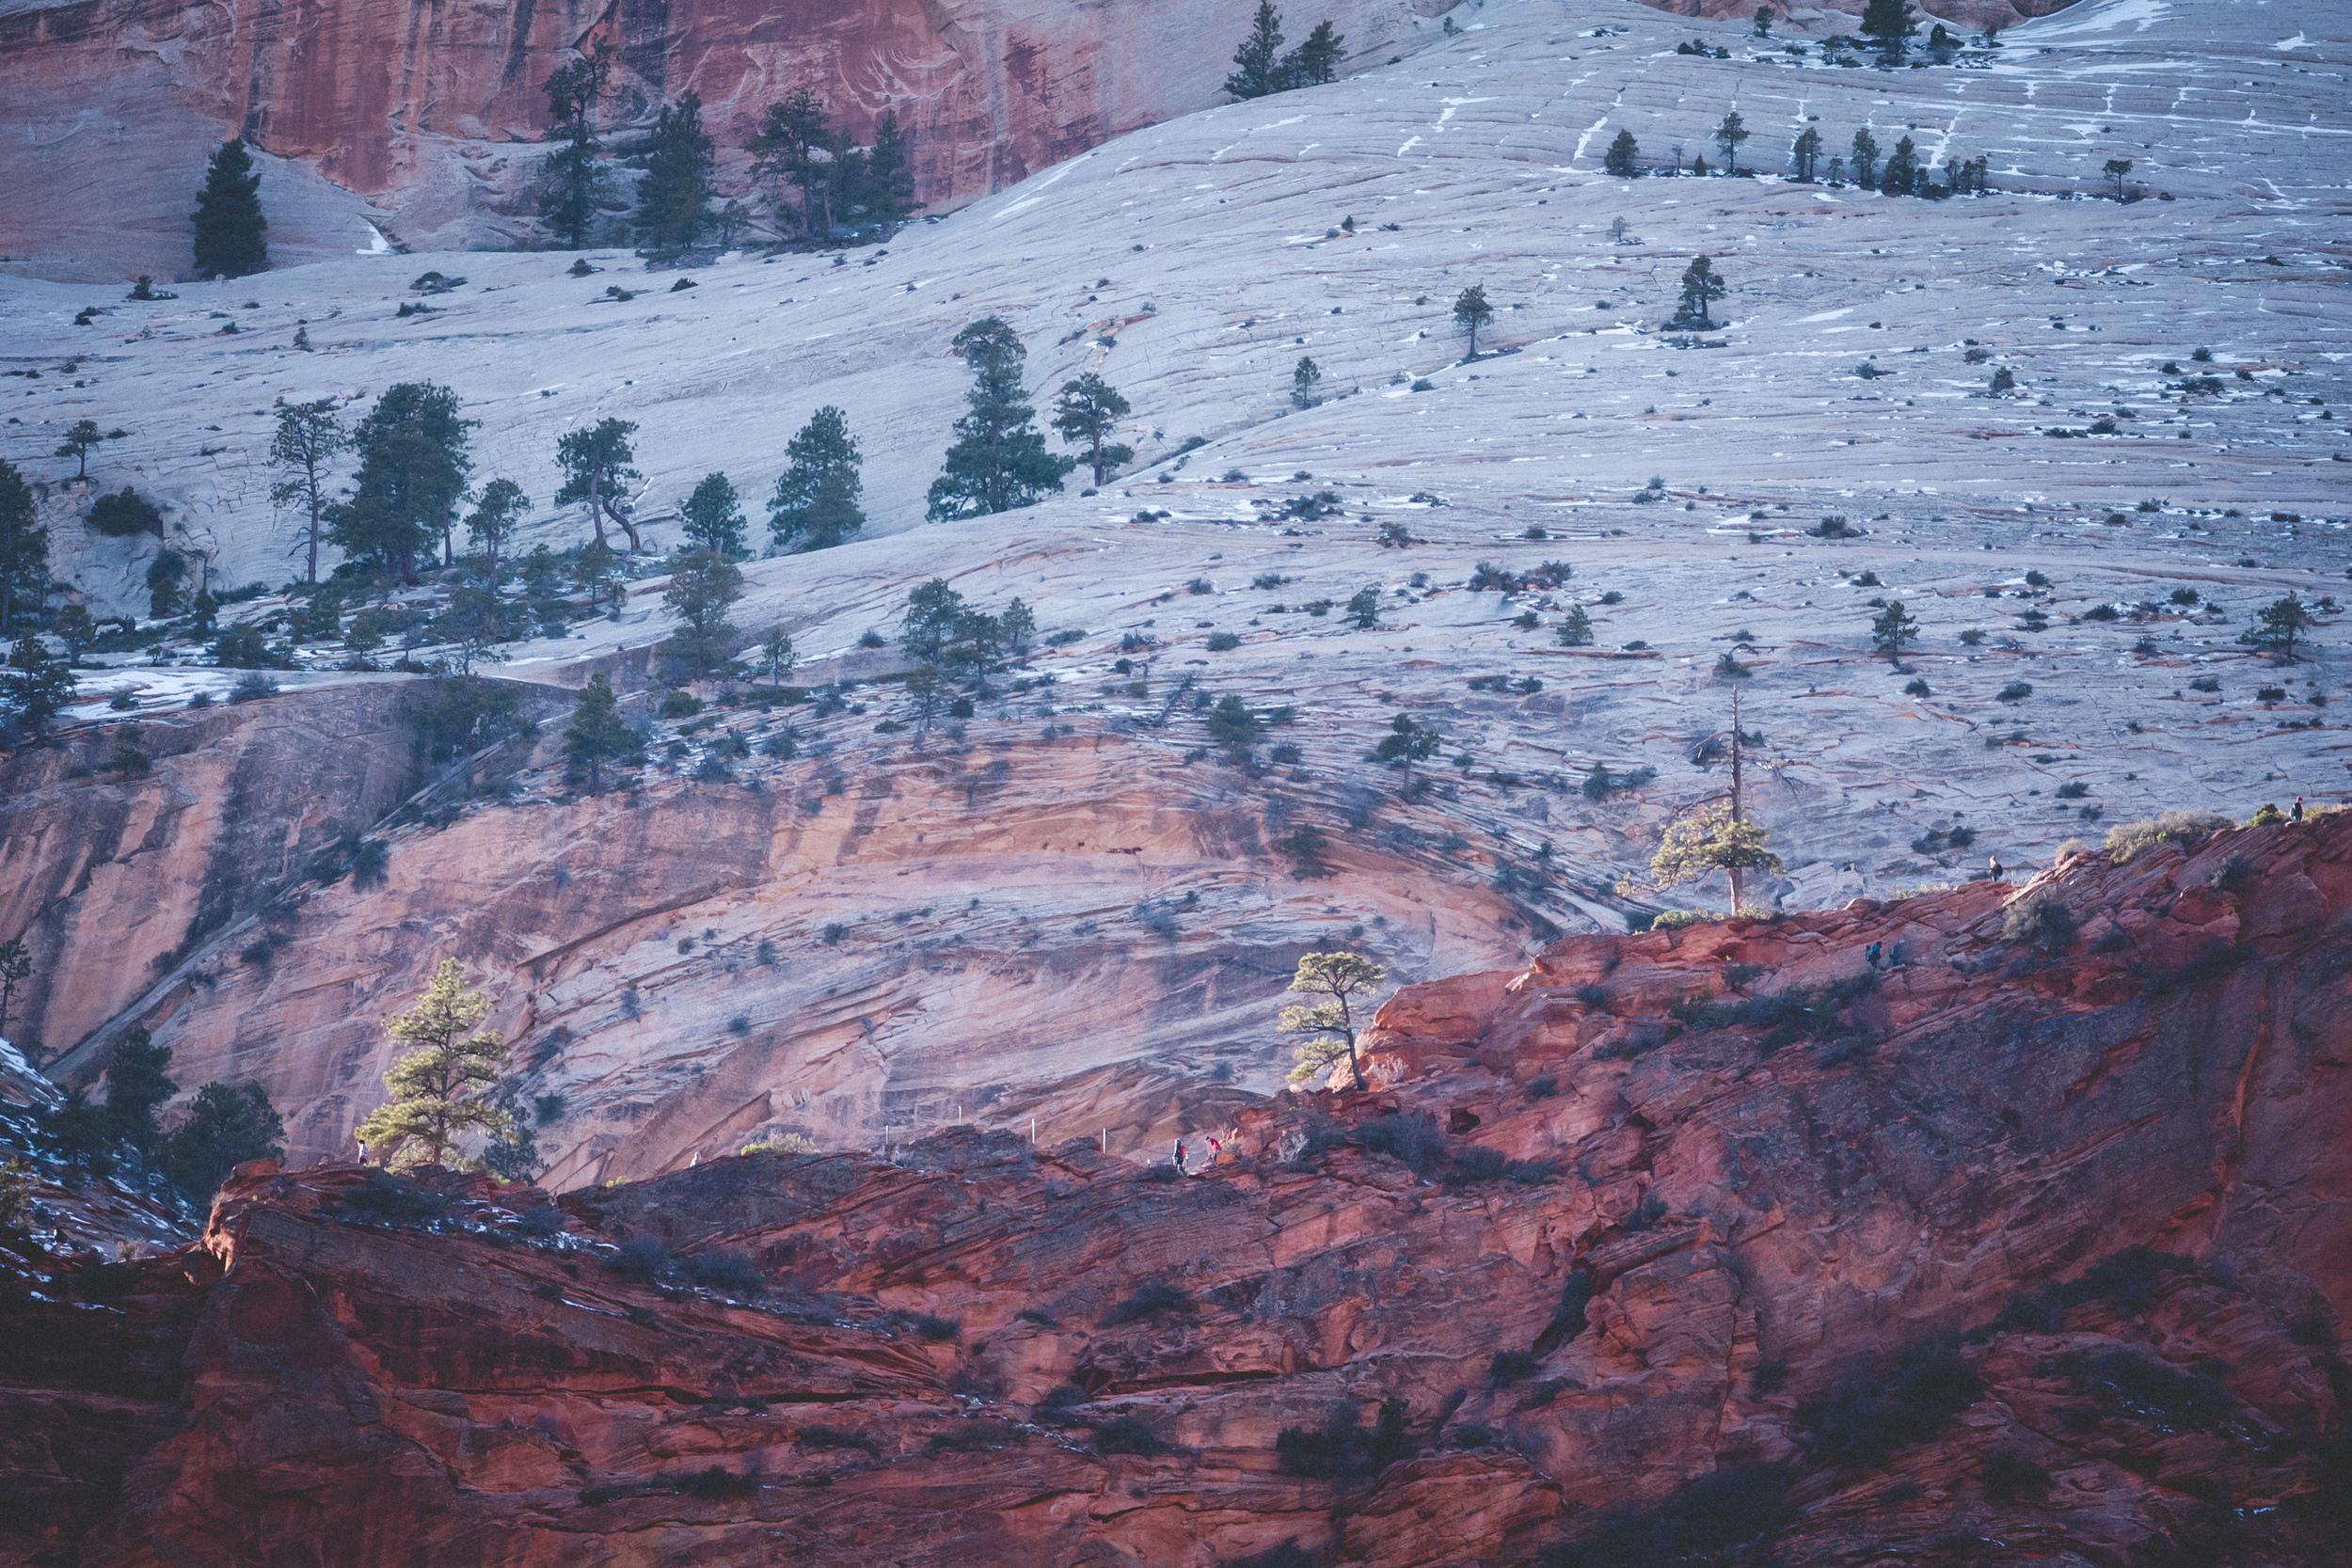 Zion-National-Park-83.jpg